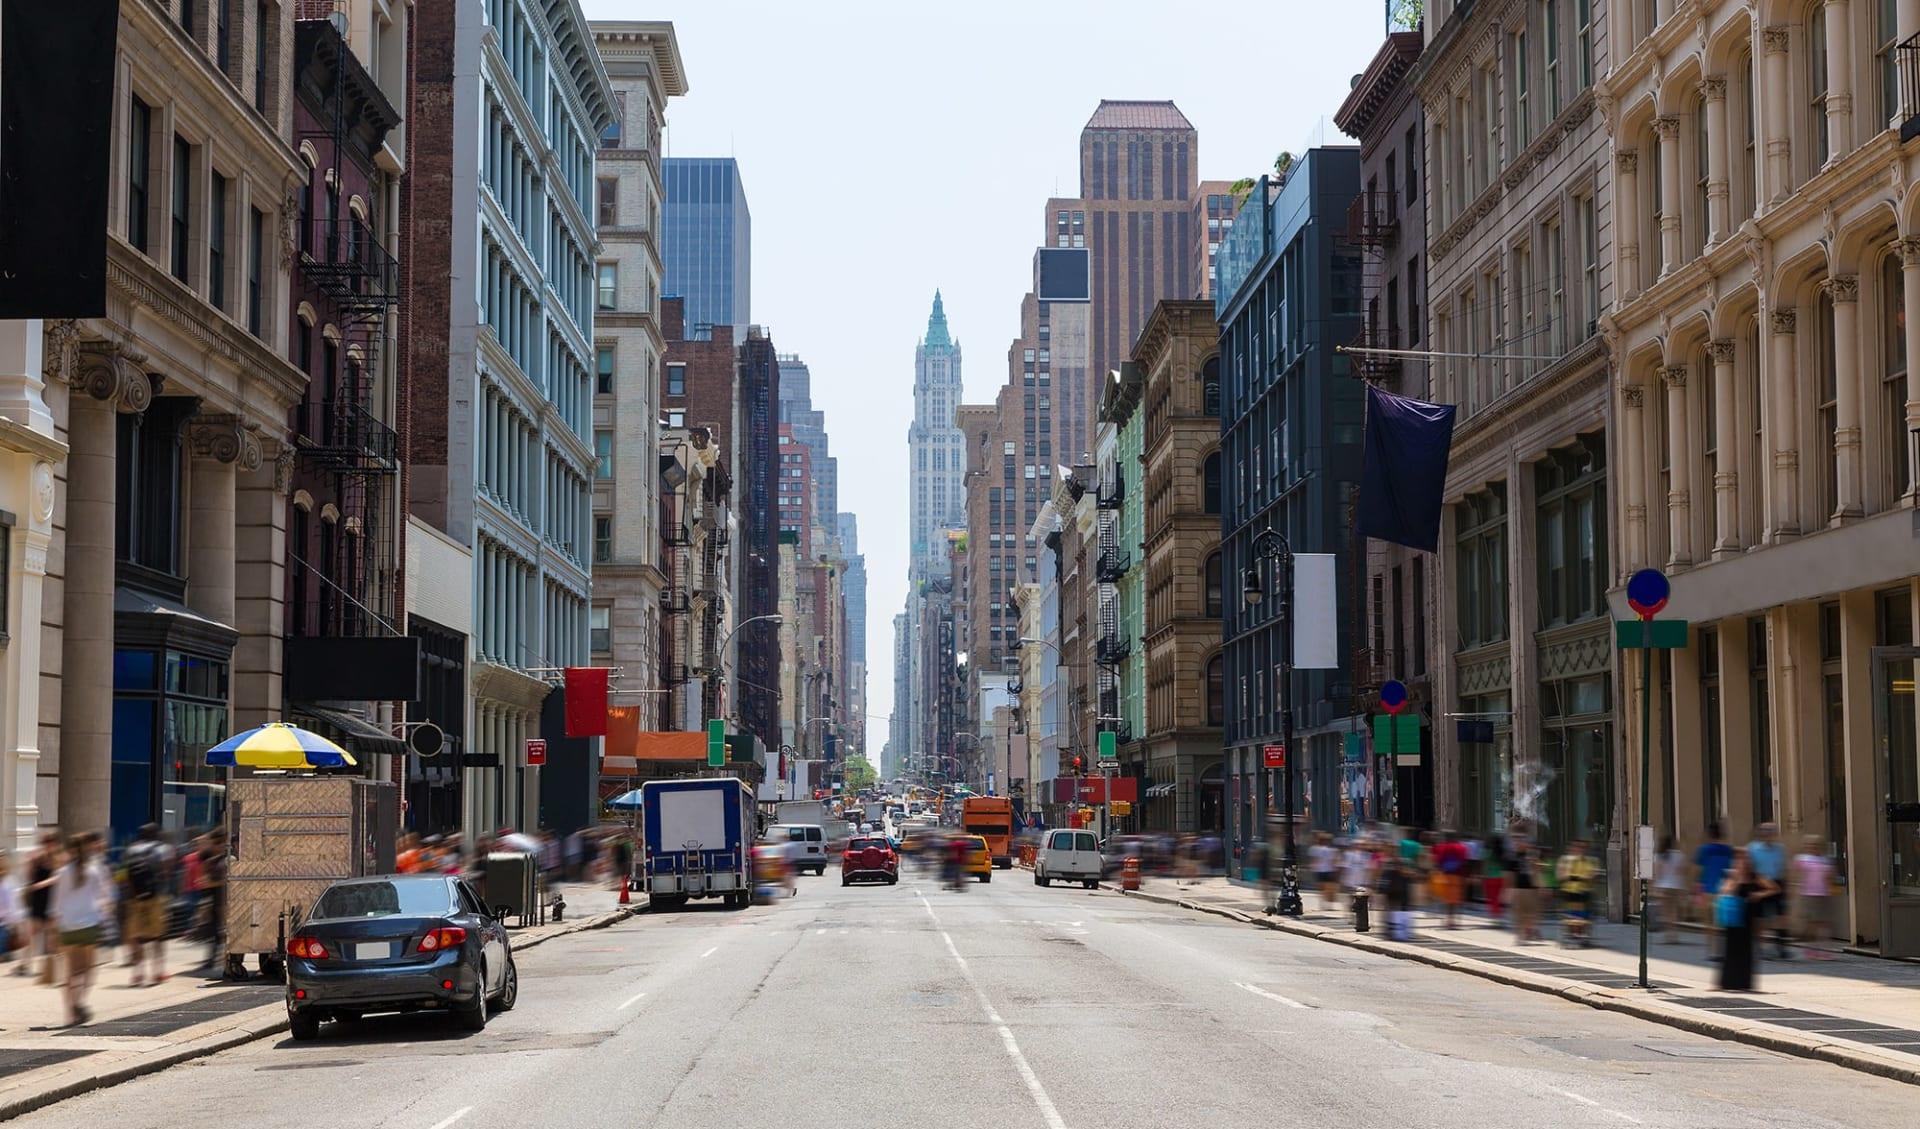 Martha Washington Hotel in New York - Manhattan: shutterstock_244419508.jpg_WEB